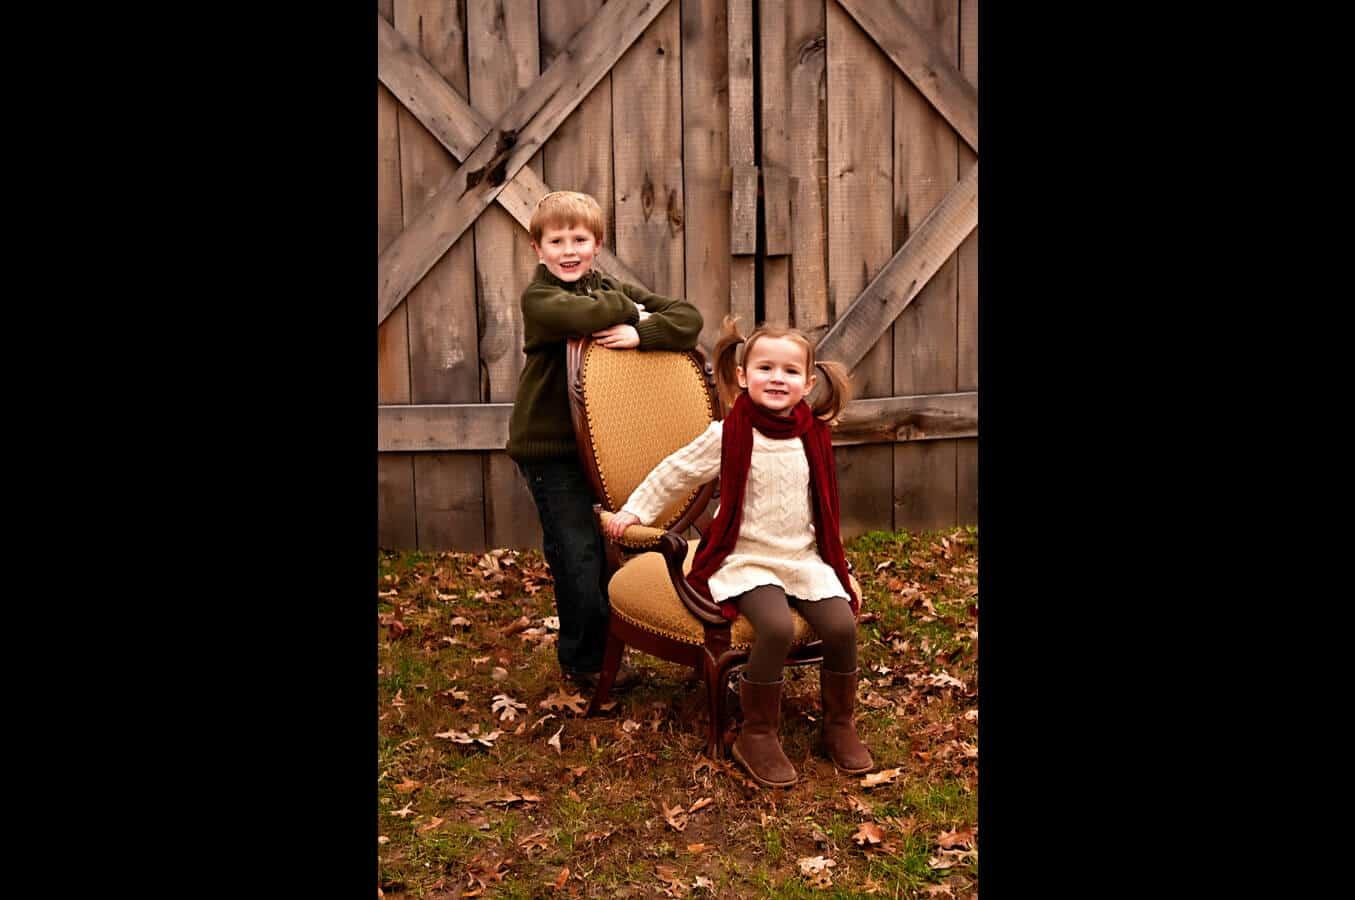 children, portrait, outdoor, autumn, natural light, Northern VA